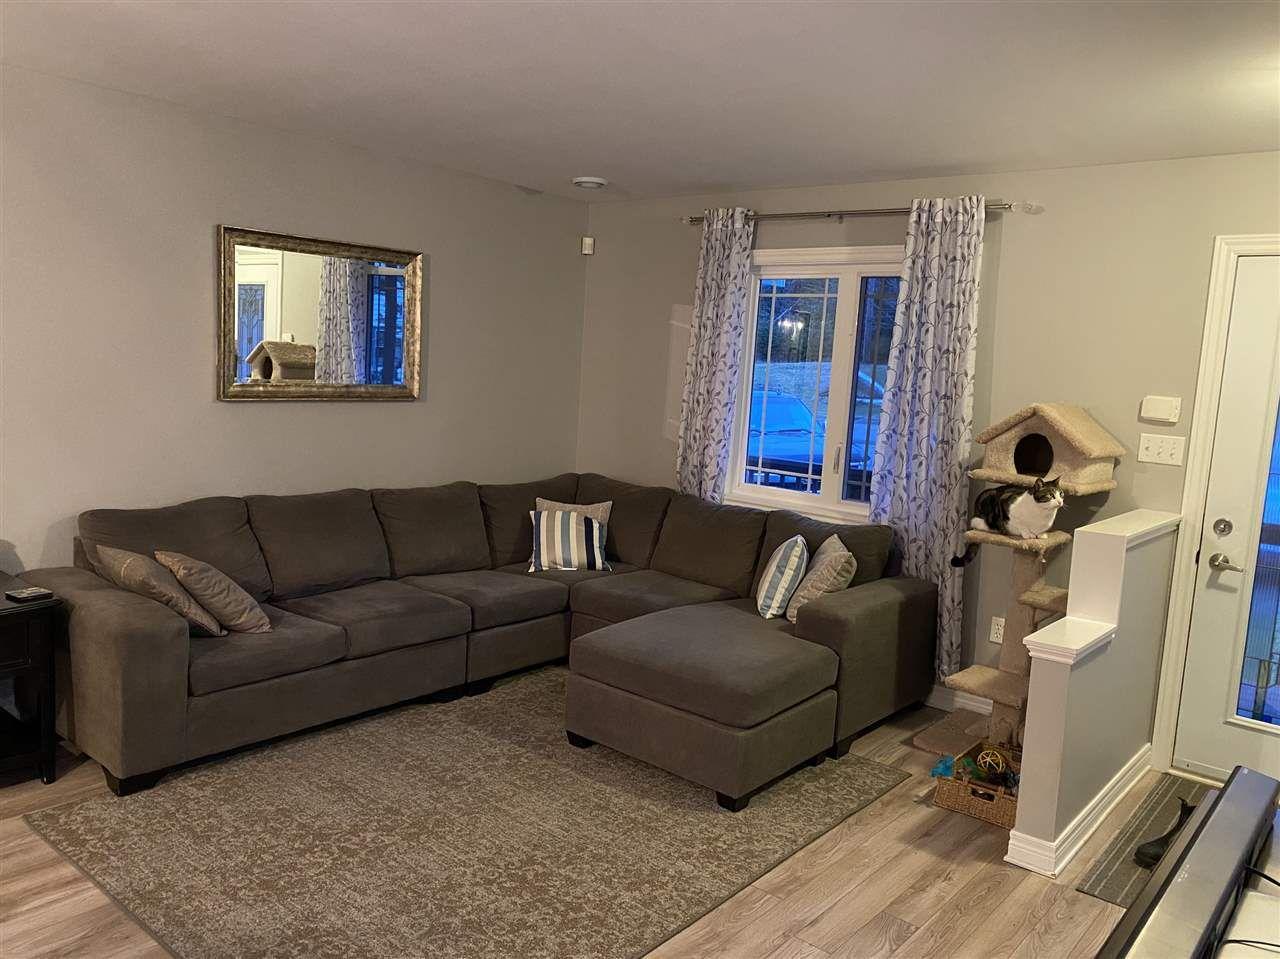 Photo 4: Photos: 7327 Main Street in Louisbourg: 206-Louisbourg Residential for sale (Cape Breton)  : MLS®# 202025505